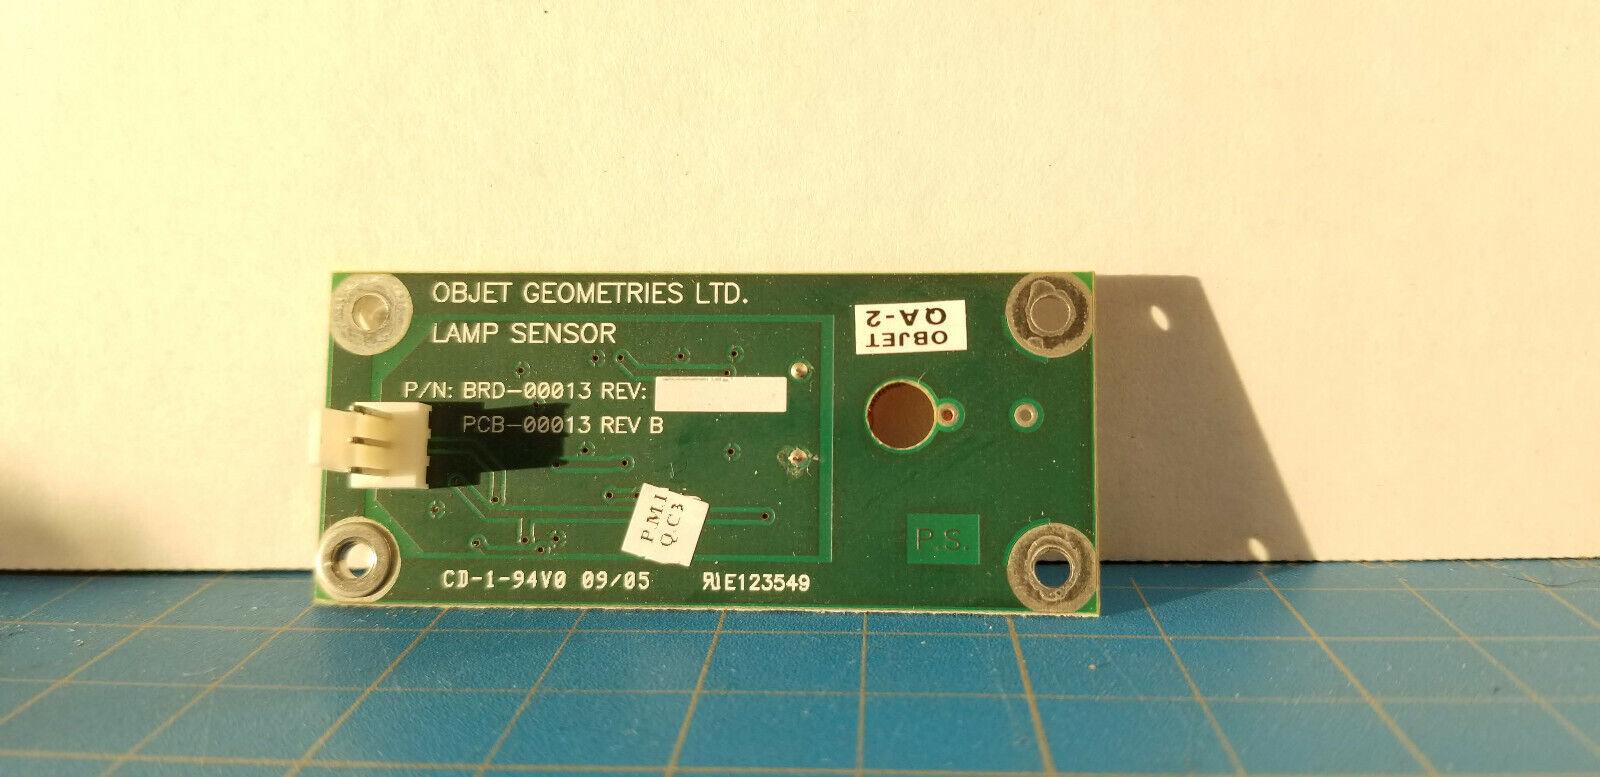 Stratasys Objet Eden 333 Parts - Objet Geometries - Lamp Sensor